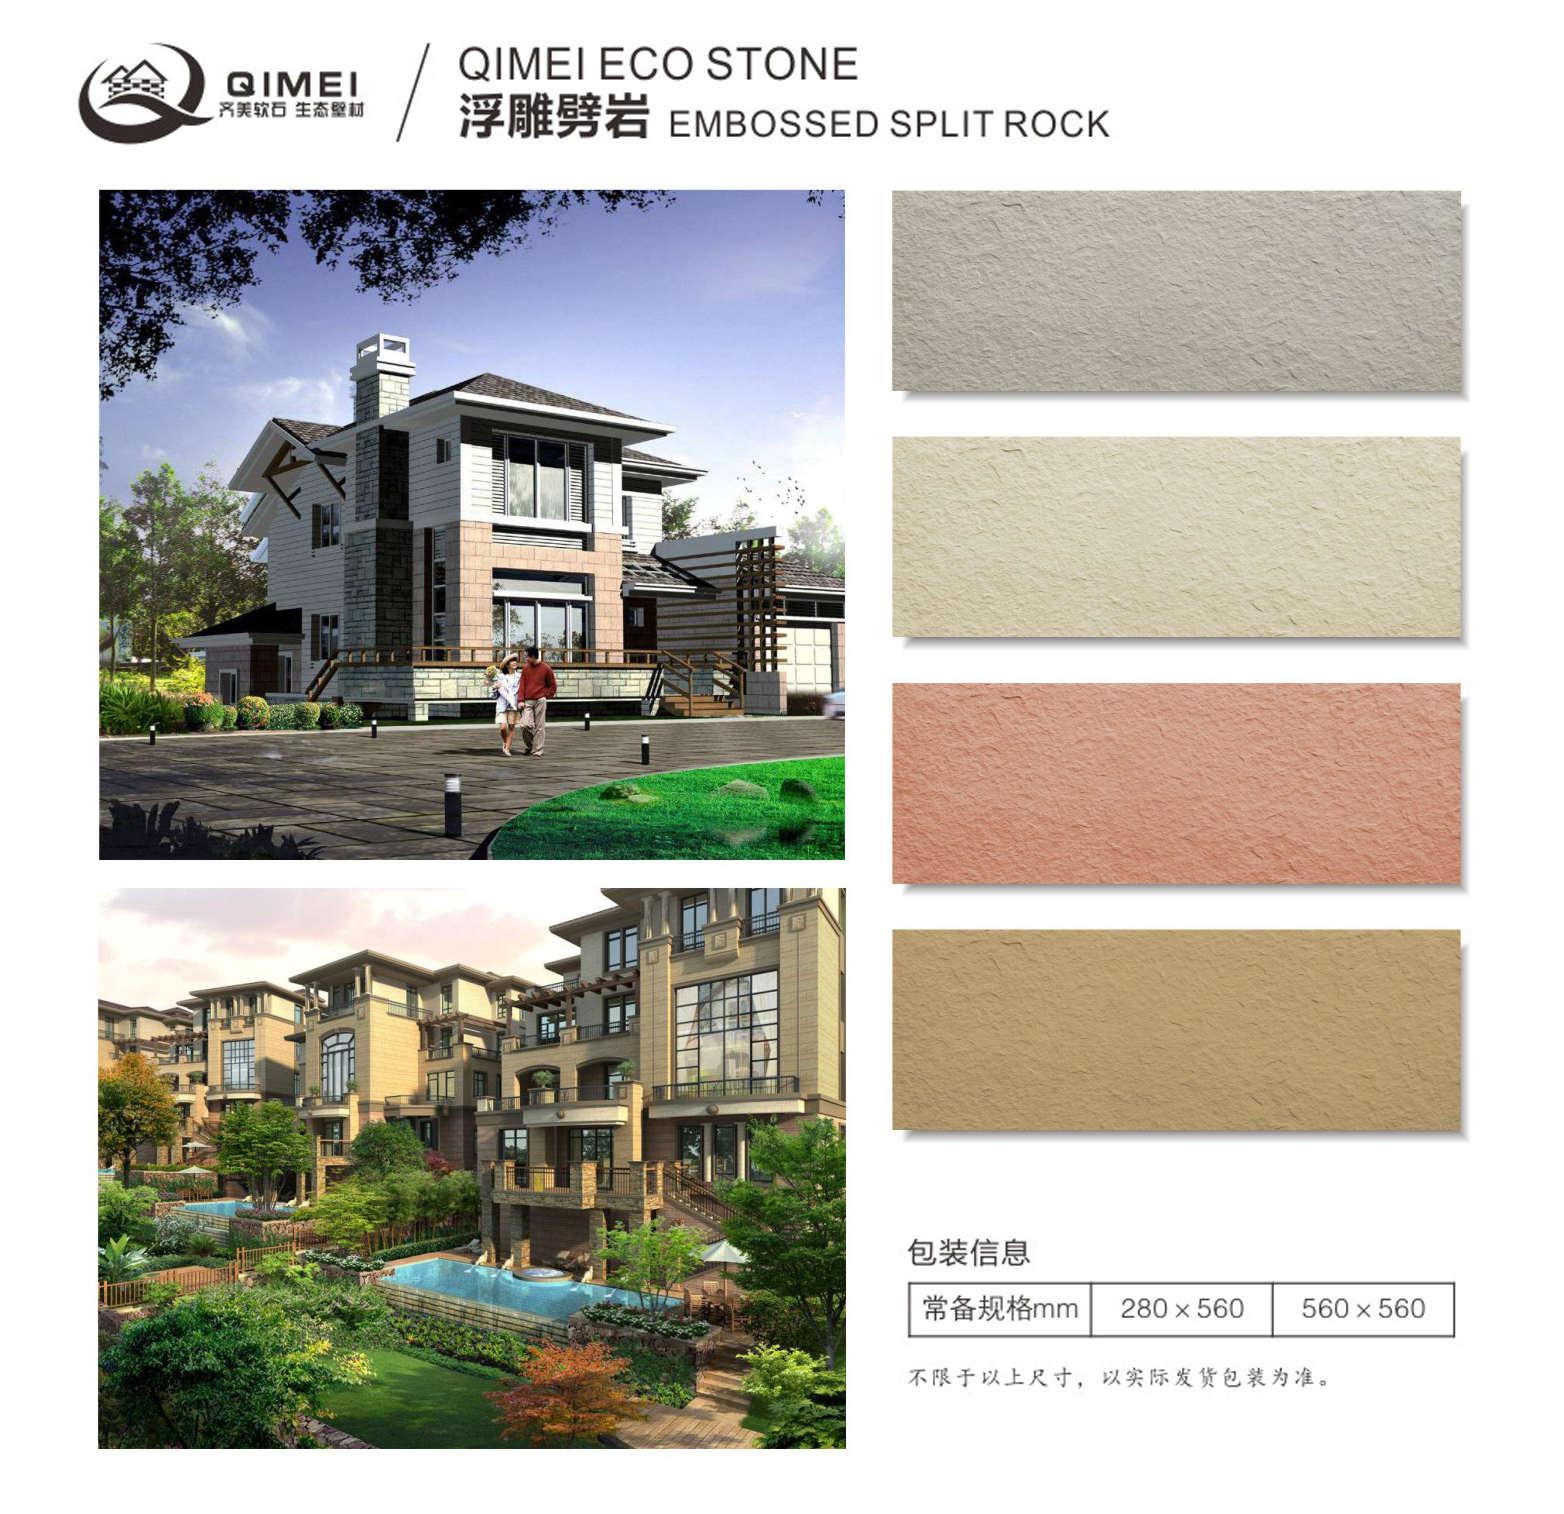 embossed spilt stone customized and personalized flexible stone/brick/tile/ceremics